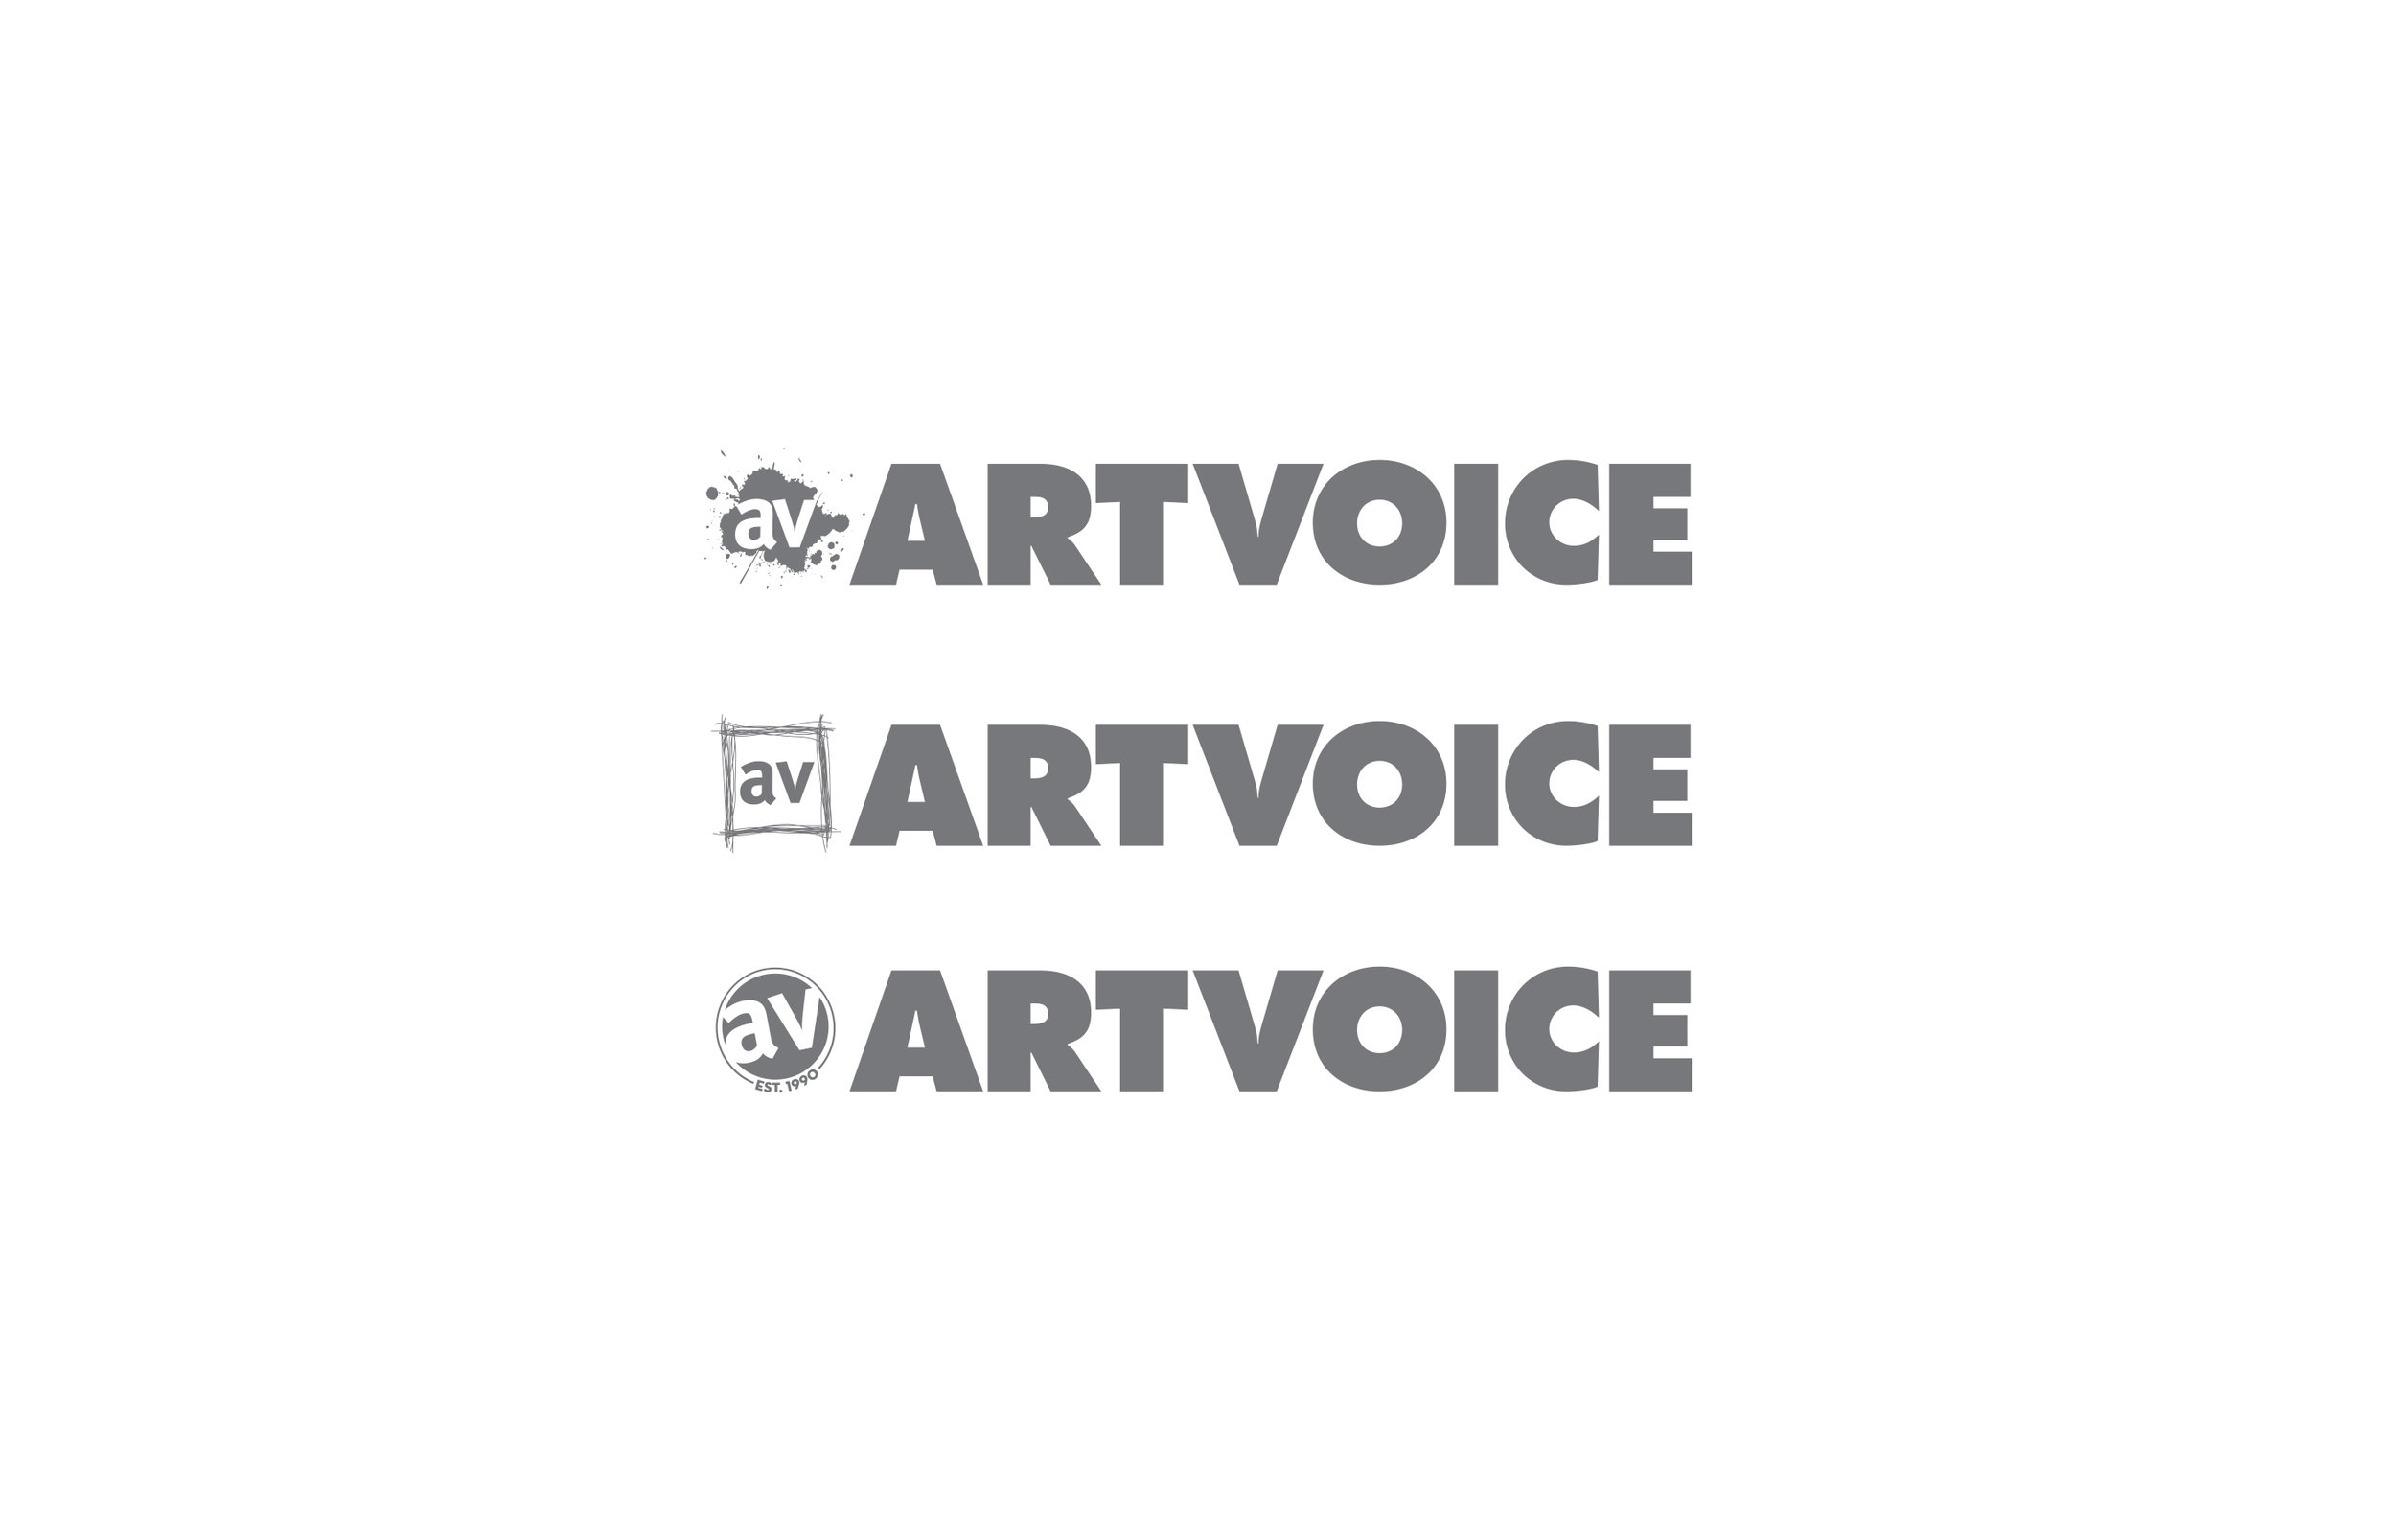 2018_TDP_2800x1800_Brand_Artvoice1.jpg